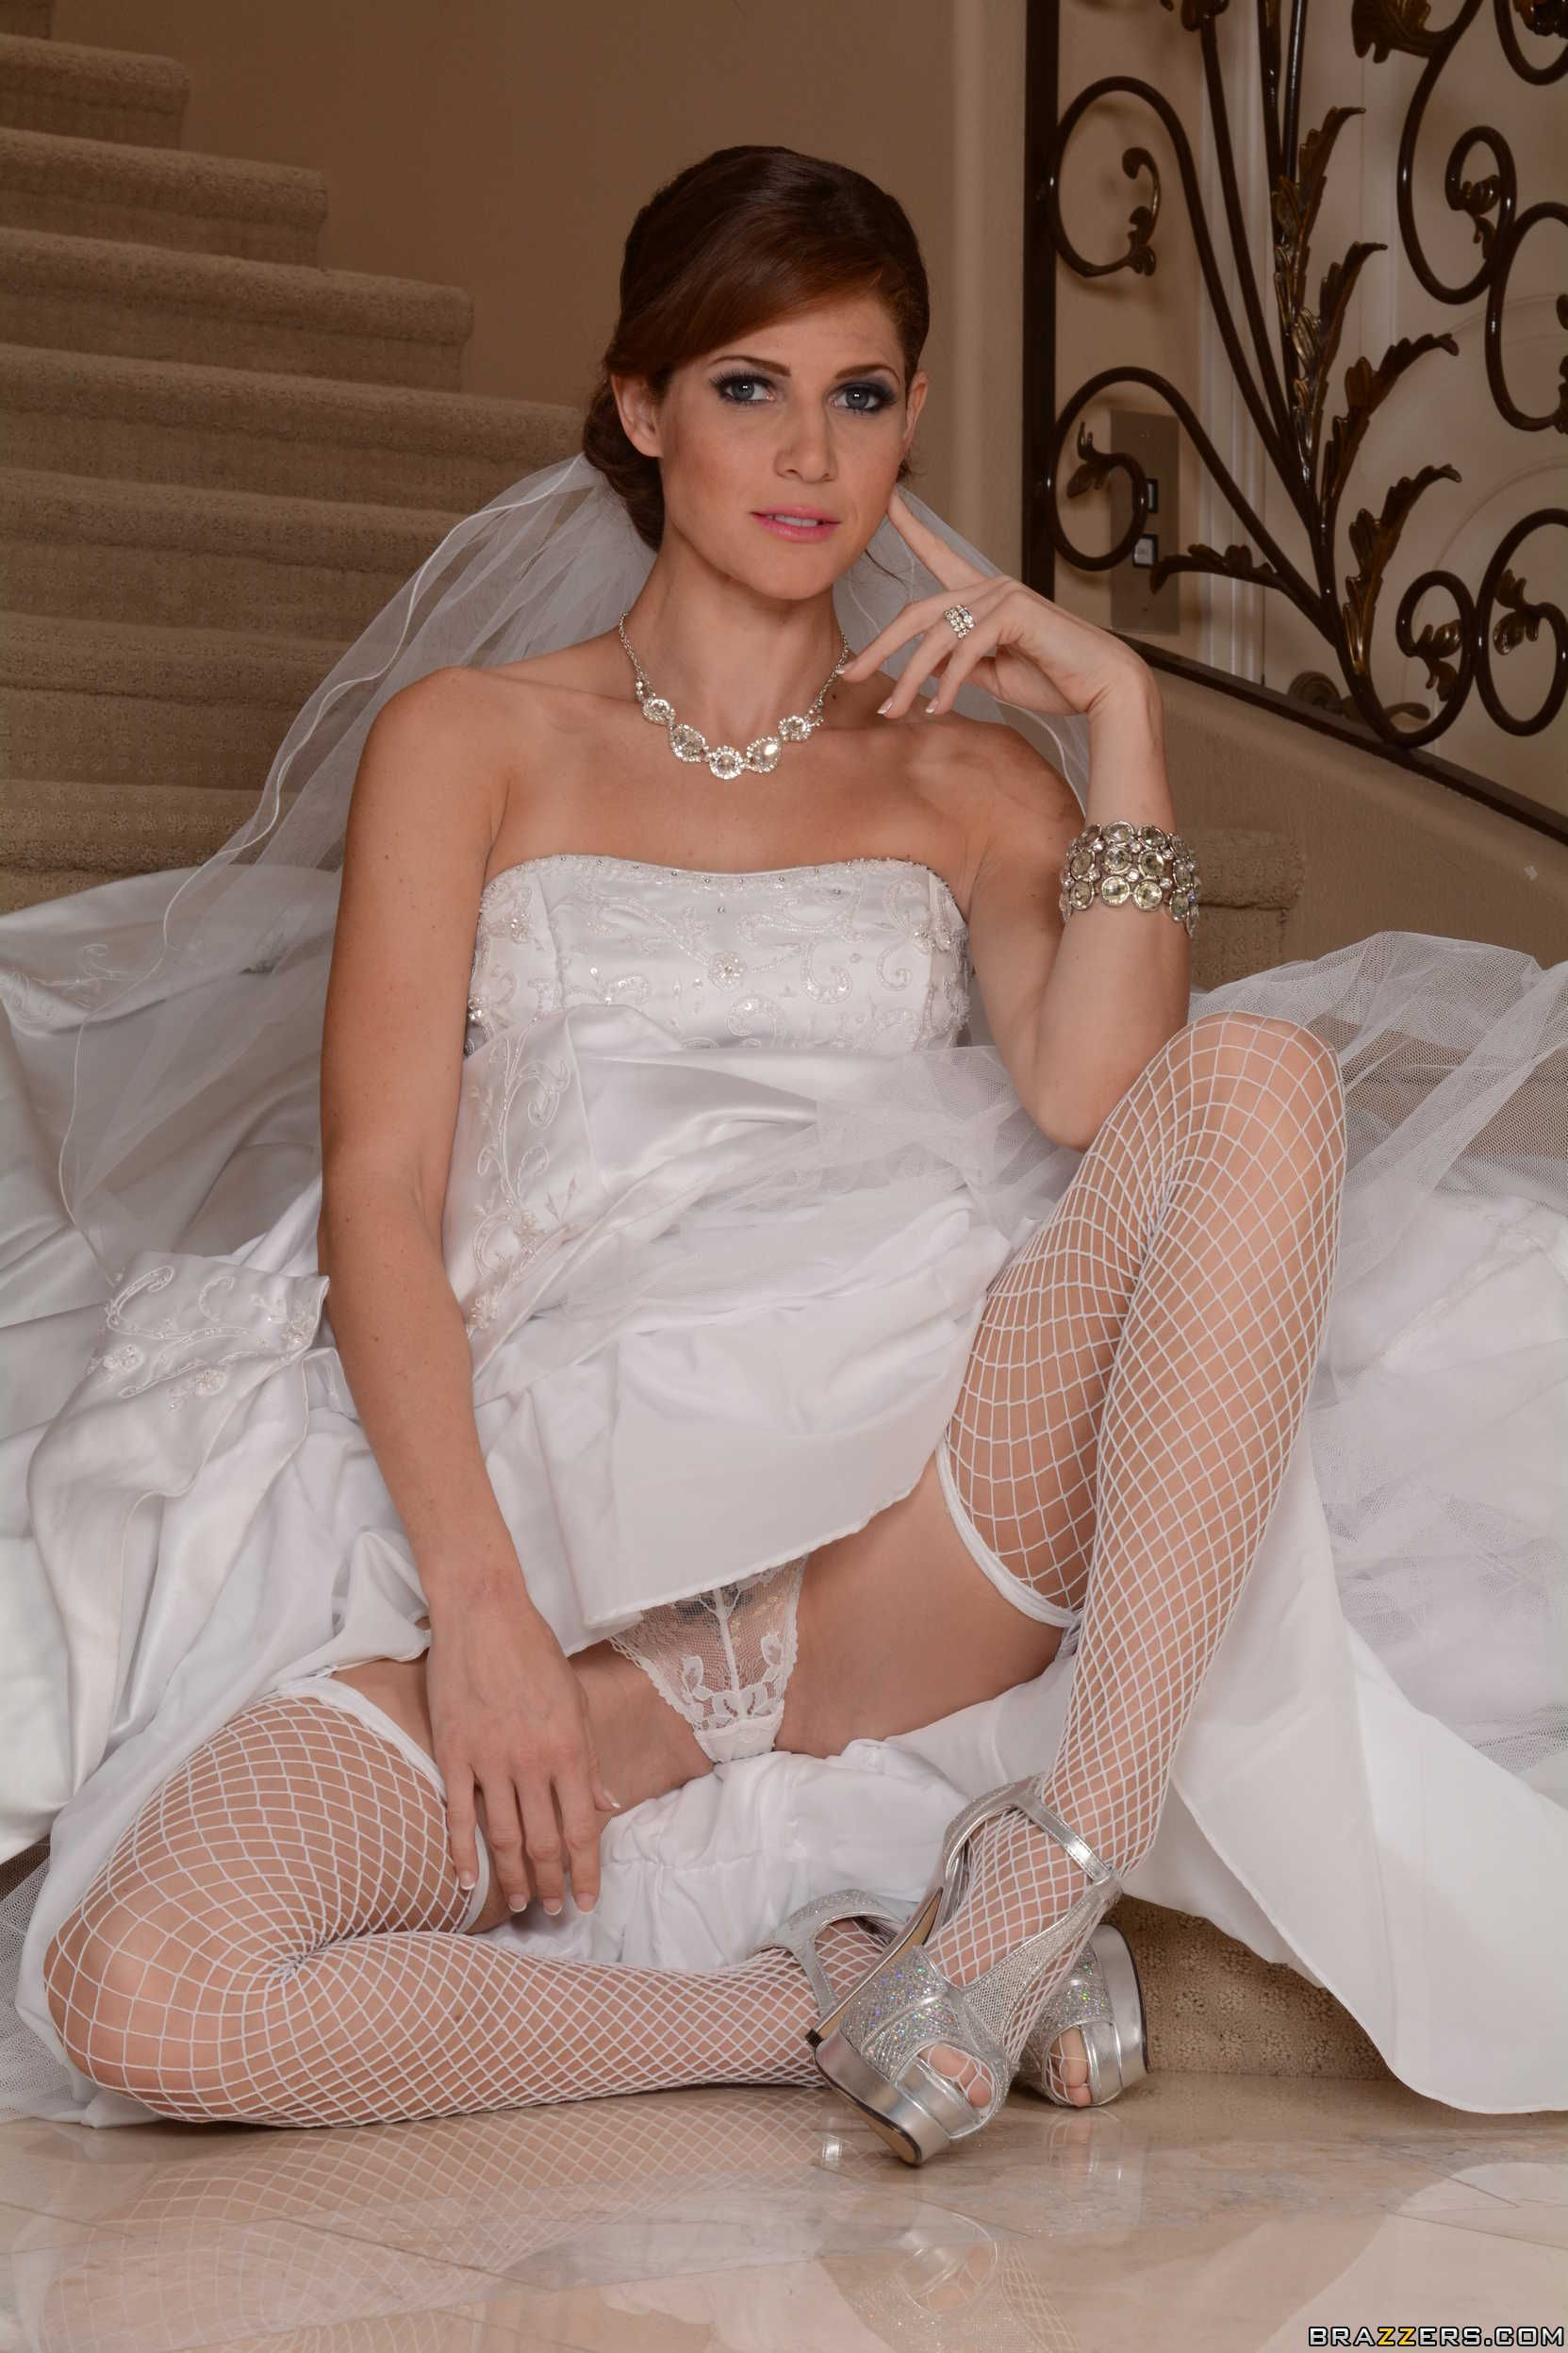 Jenni lee the wedding photographer